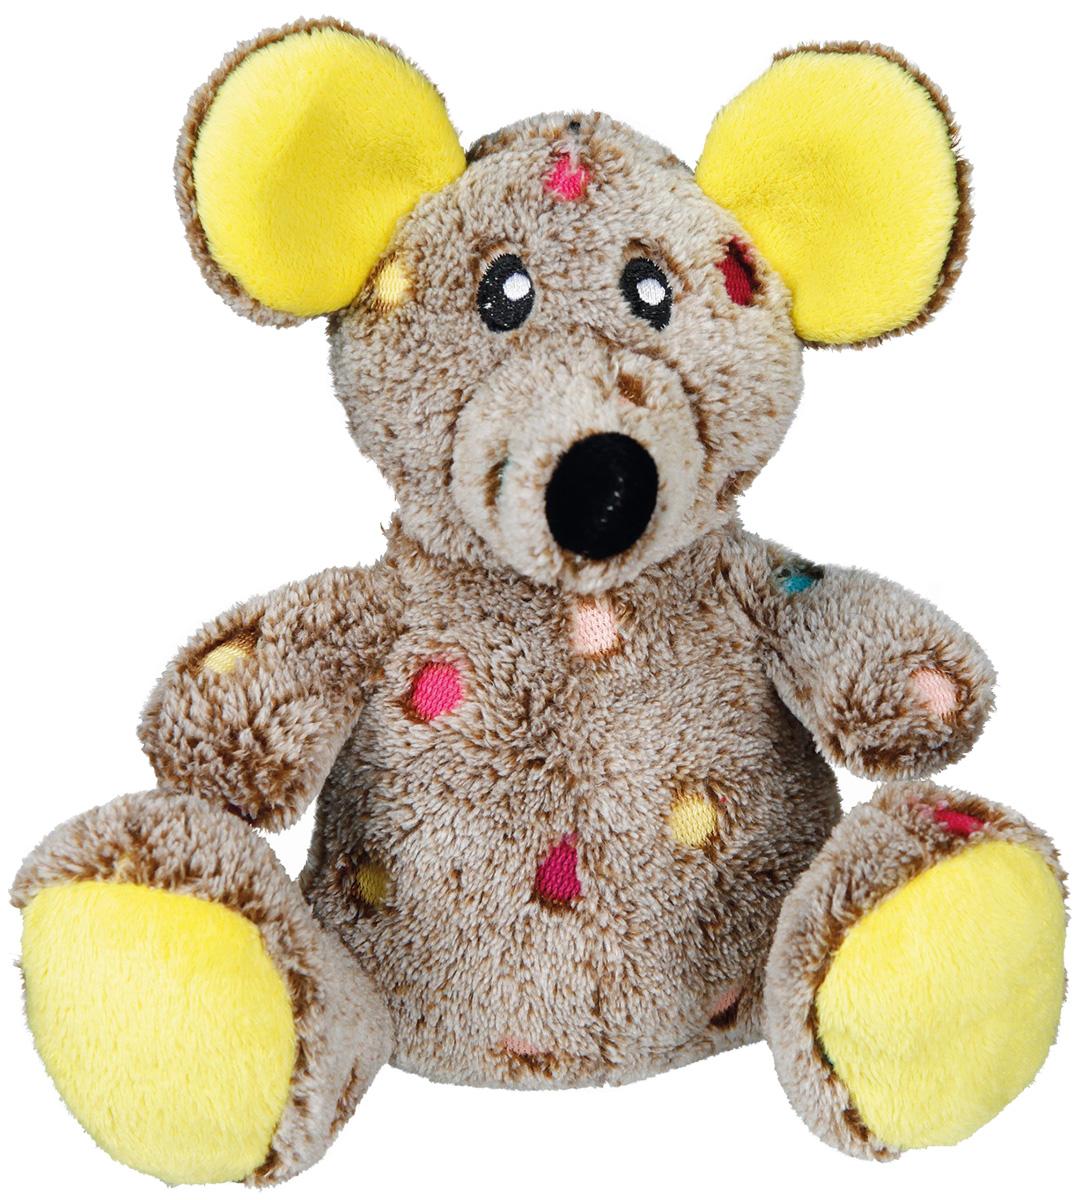 Игрушка для собак Trixie Мышка плюш 17 см (1 шт)